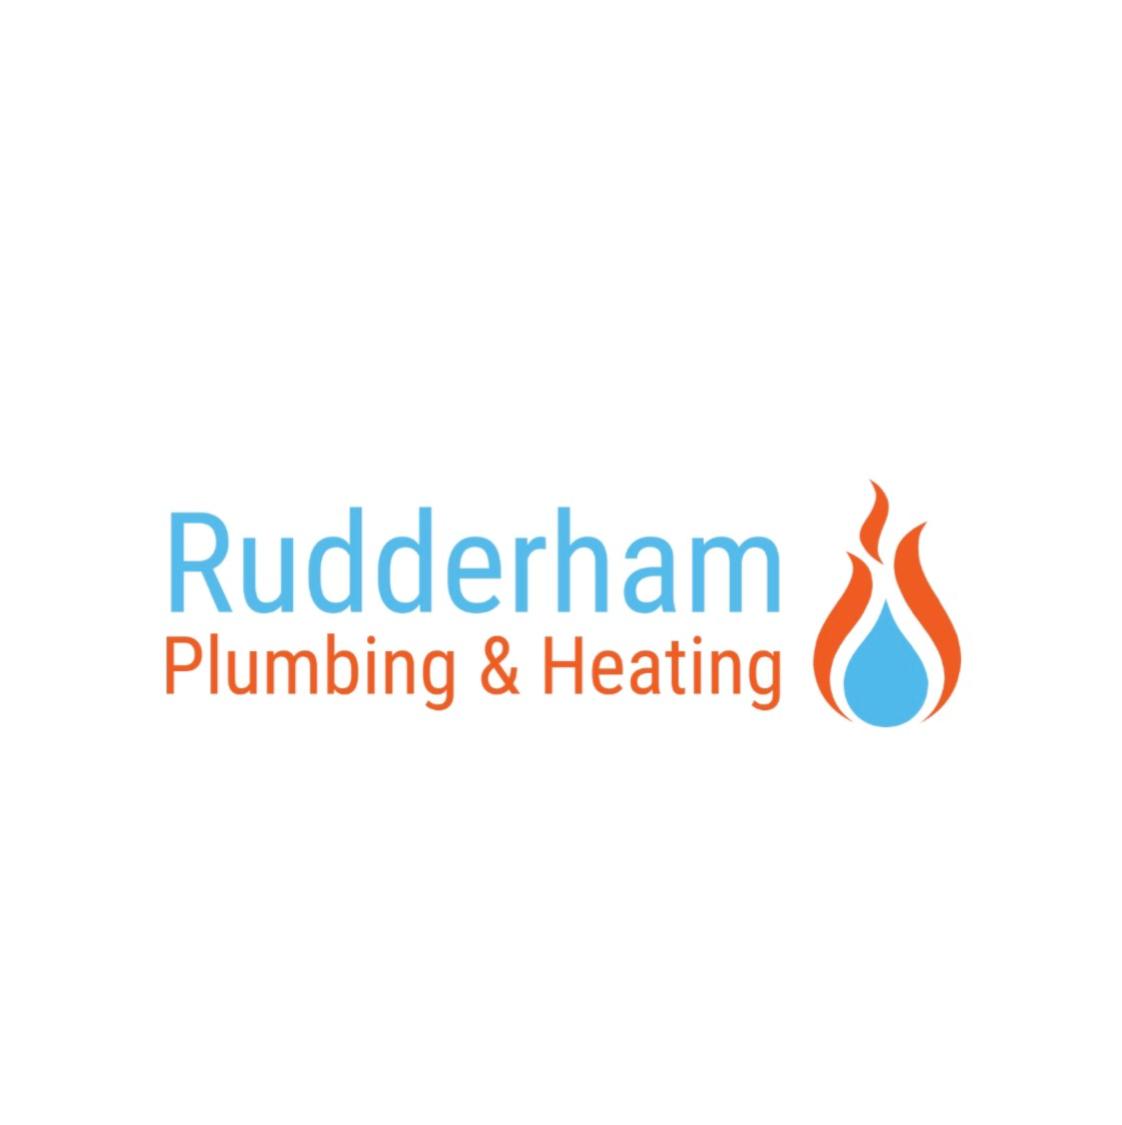 Rudderham Plumbing & Heating